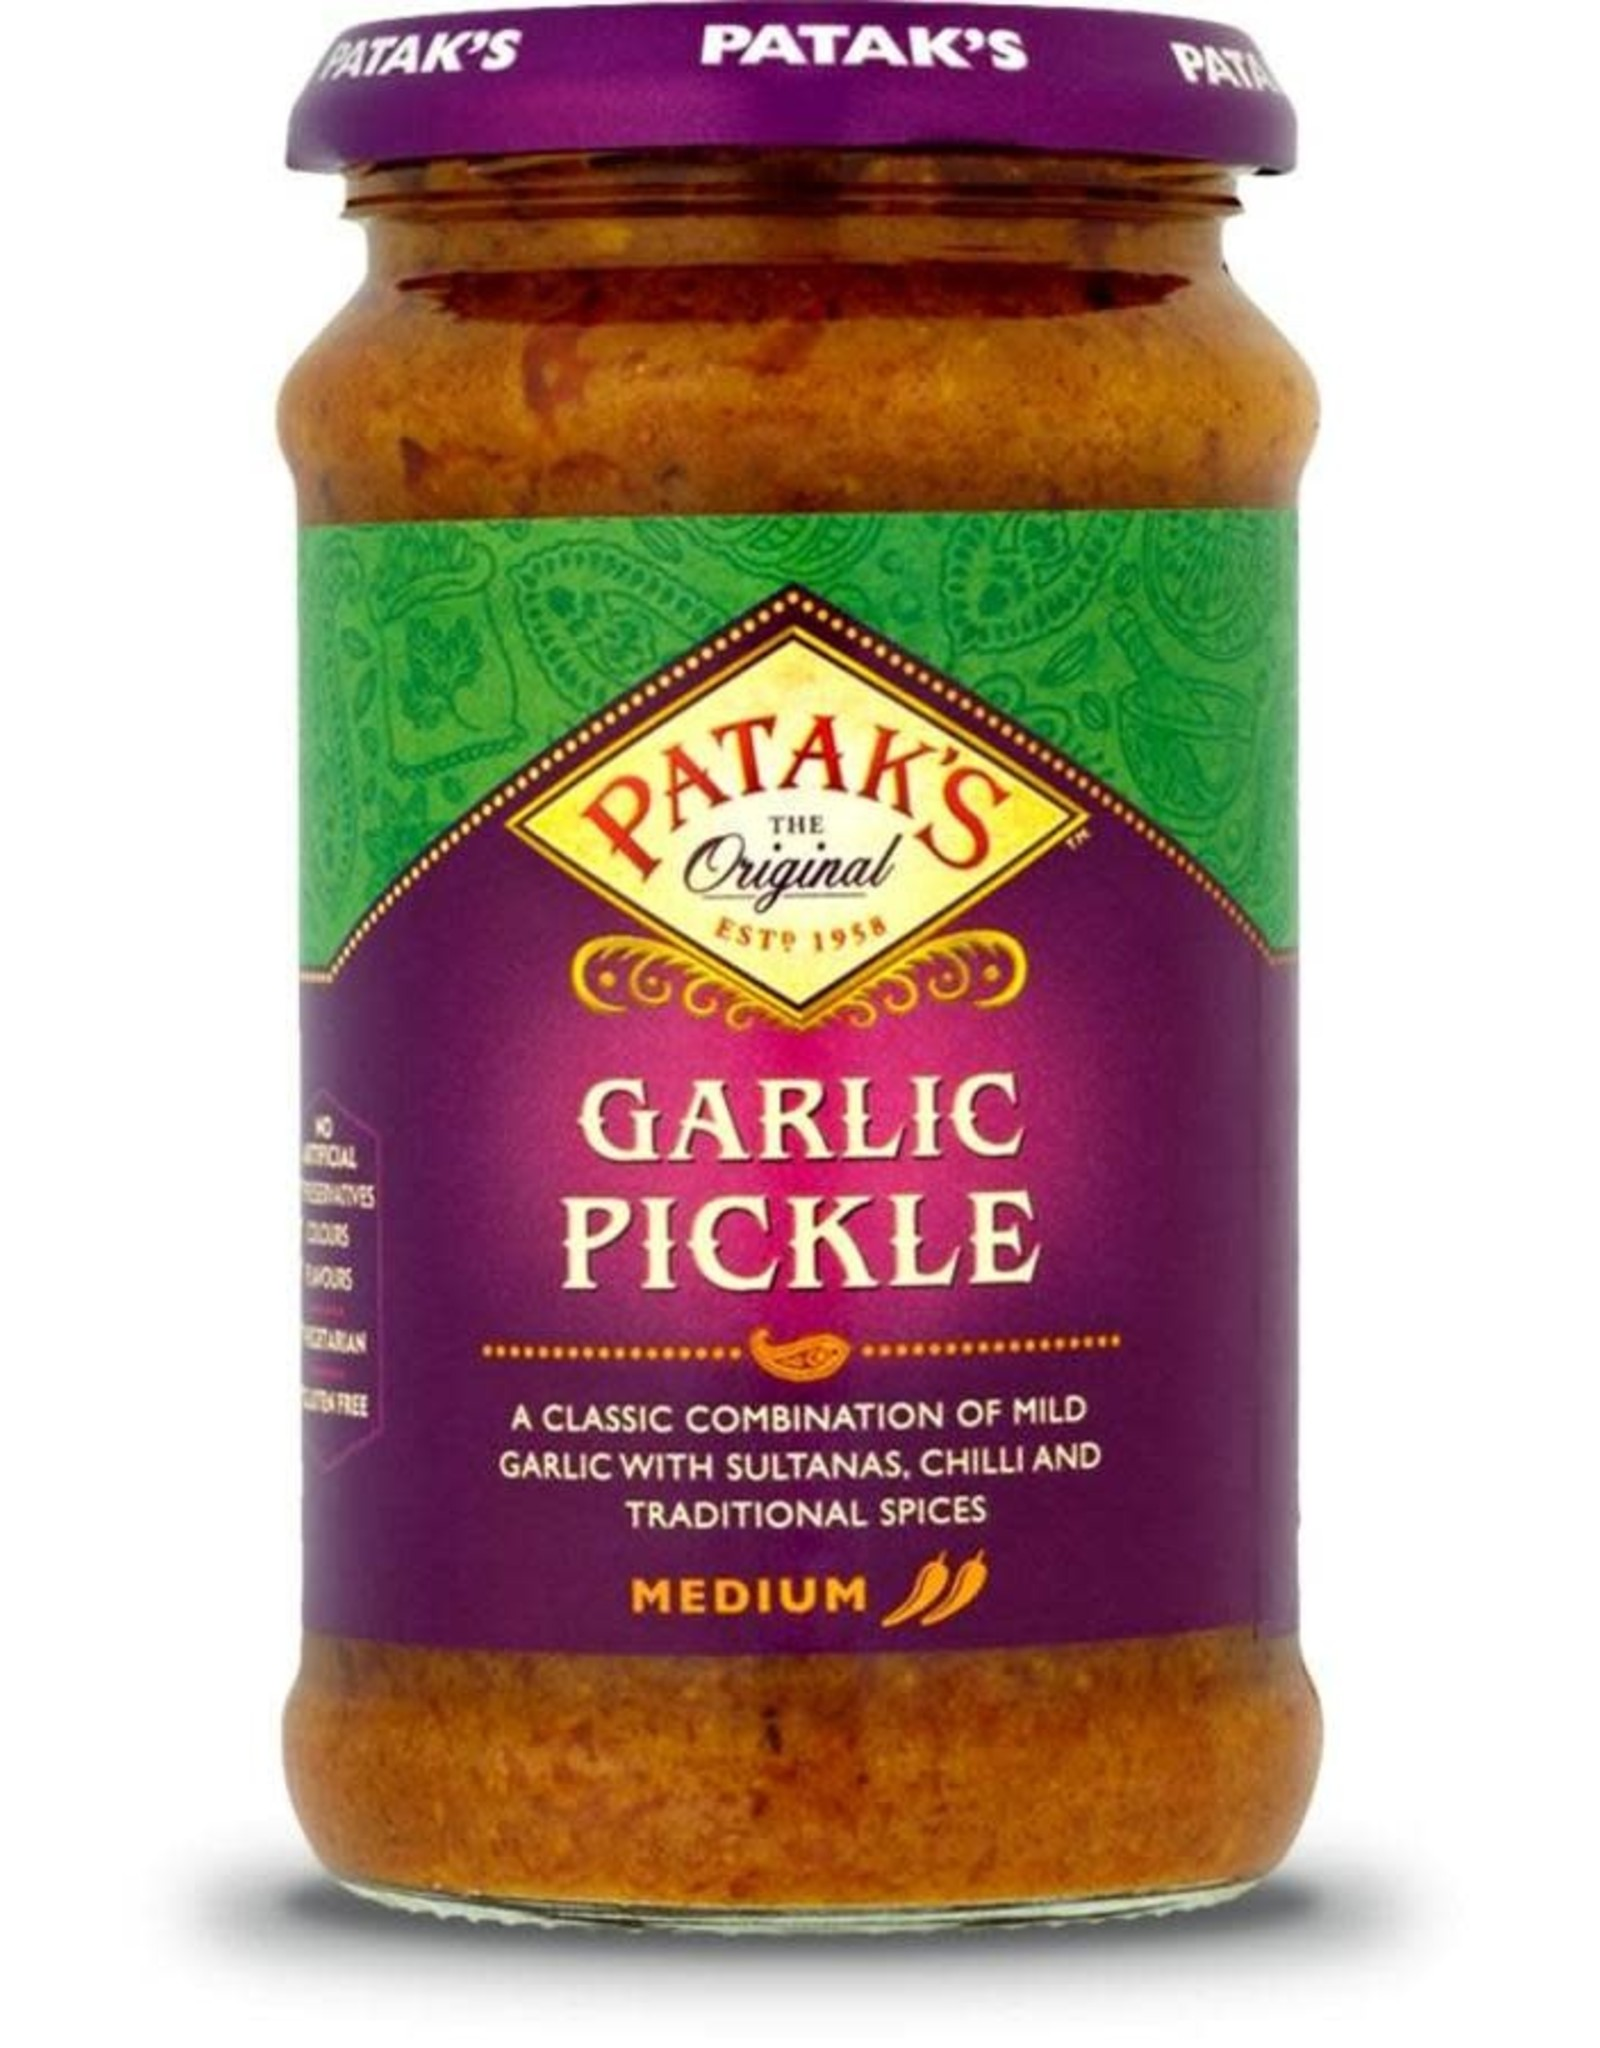 Patak's Patak's Garlic Pickle 283g